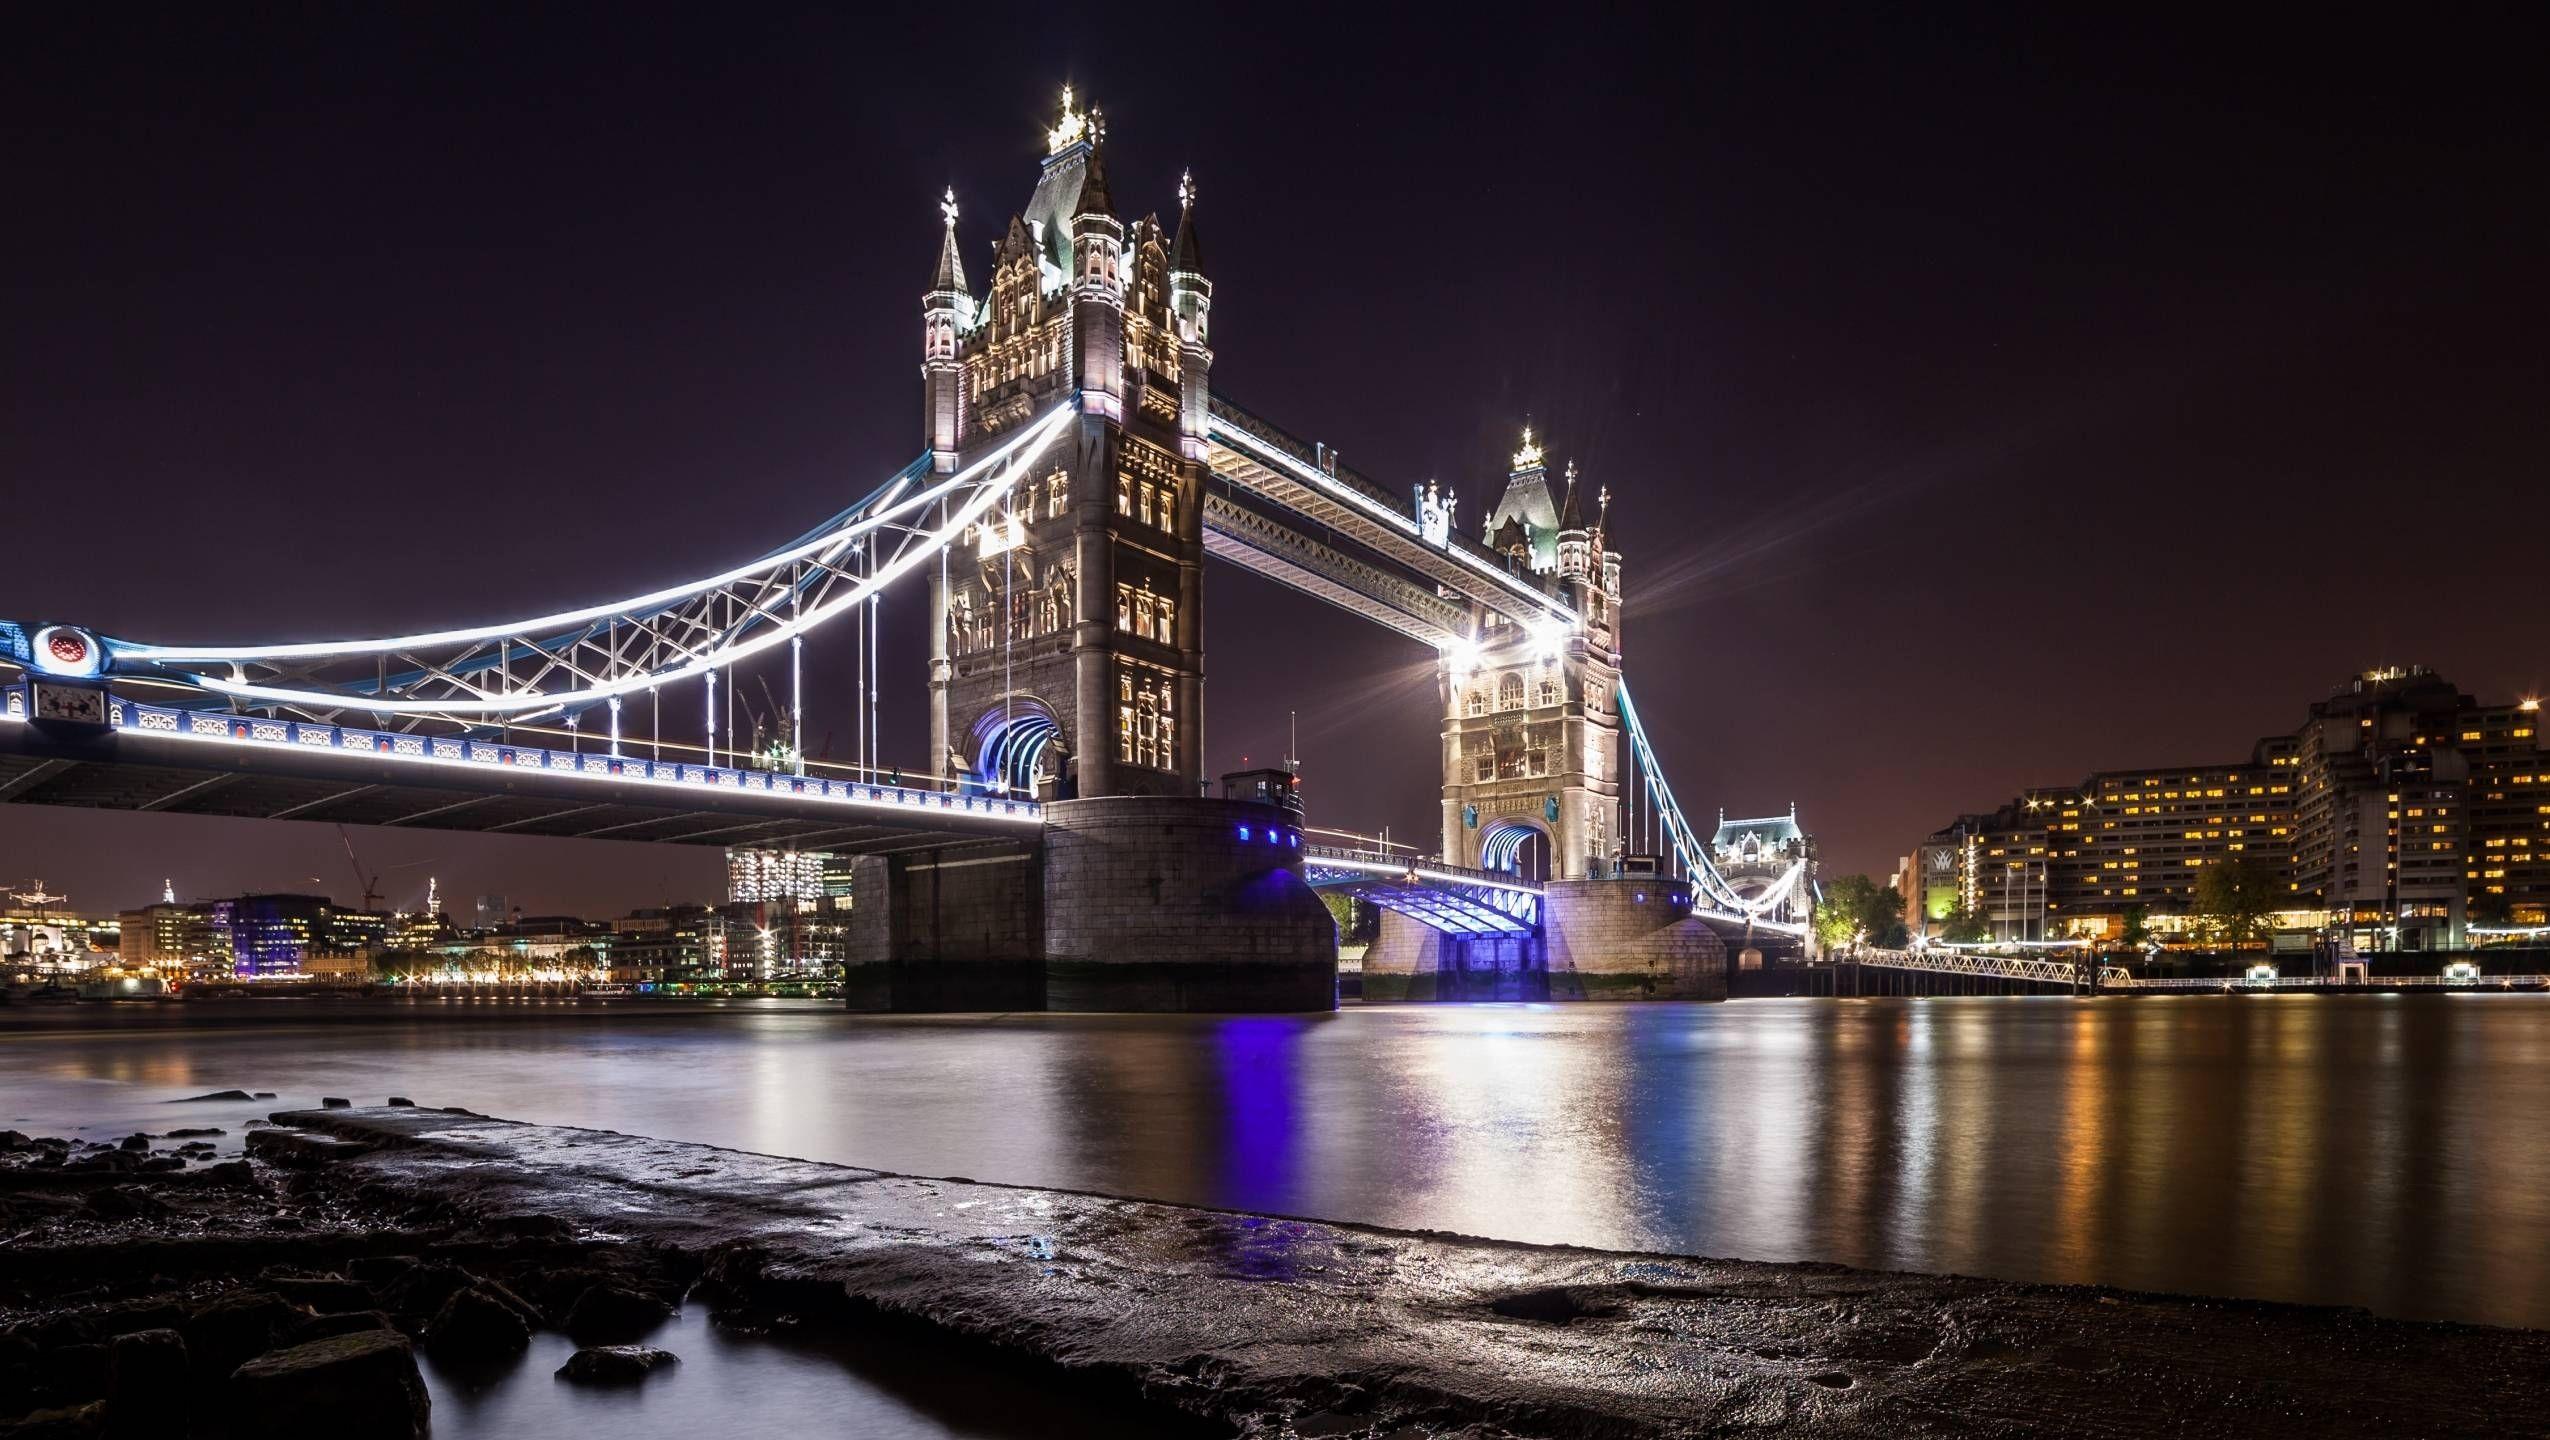 Res: 2550x1440, Tower on Bridge HD Wallpapers 1024×576 Bridge Pictures Wallpapers (39  Wallpapers) | Adorable Wallpapers